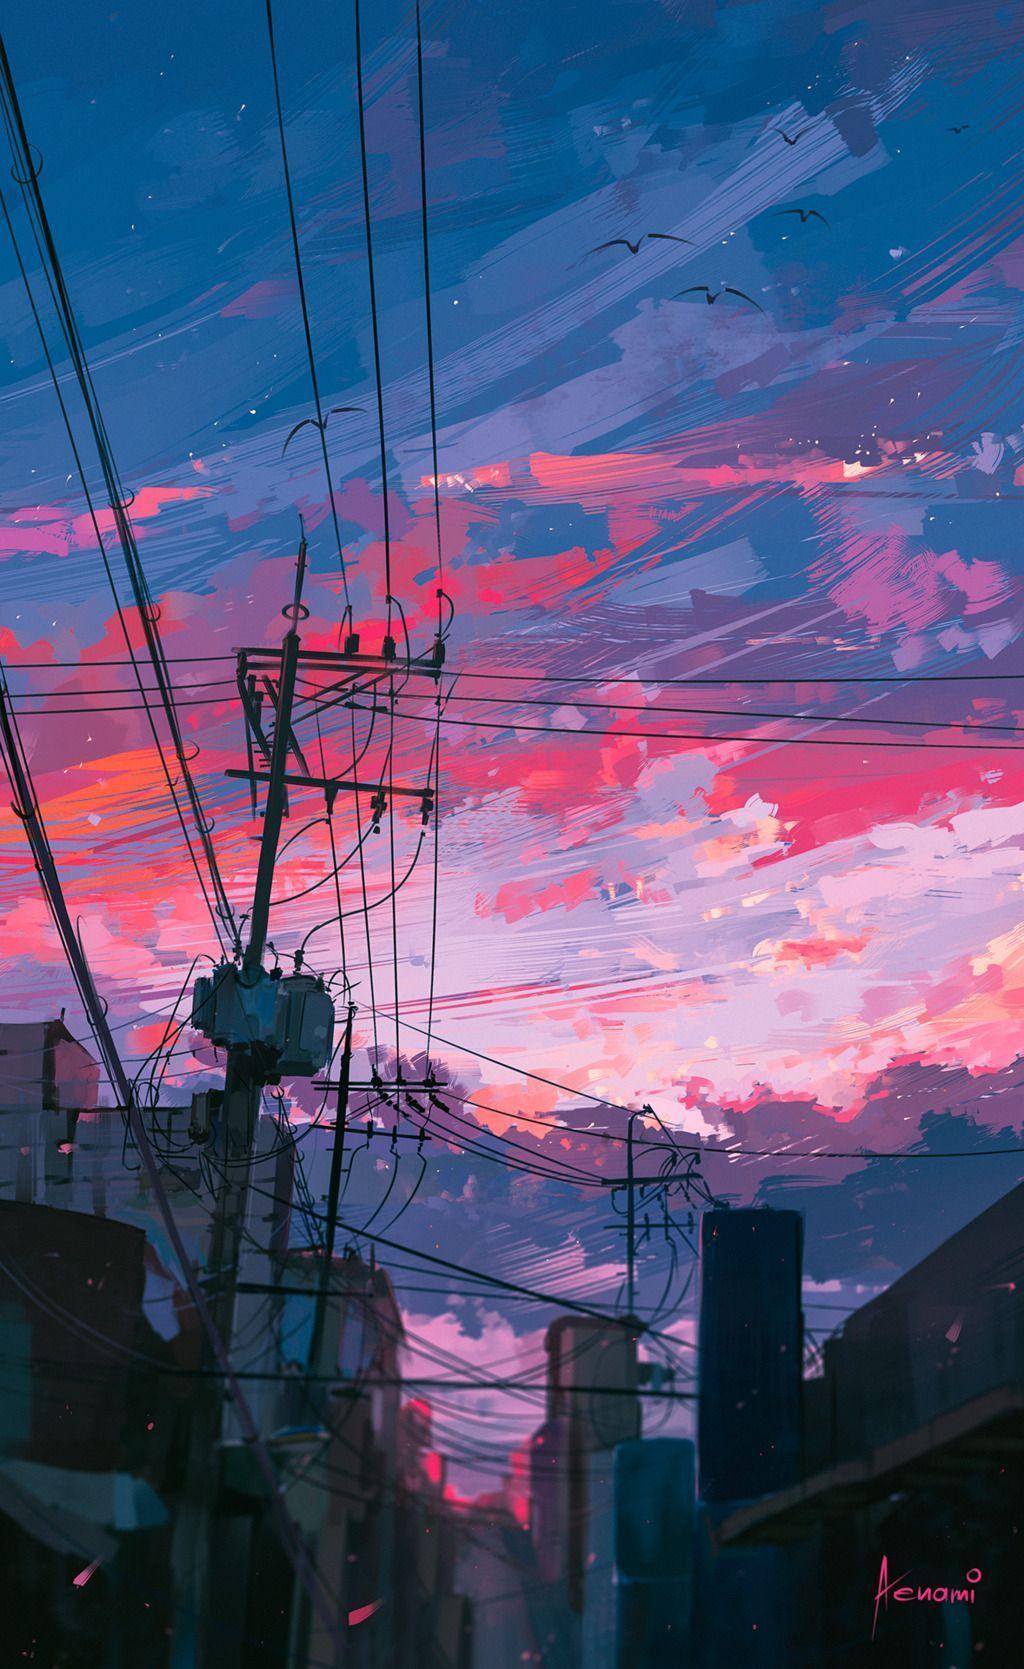 Anime Aesthetic Wallpaper Zona Ilmu 10